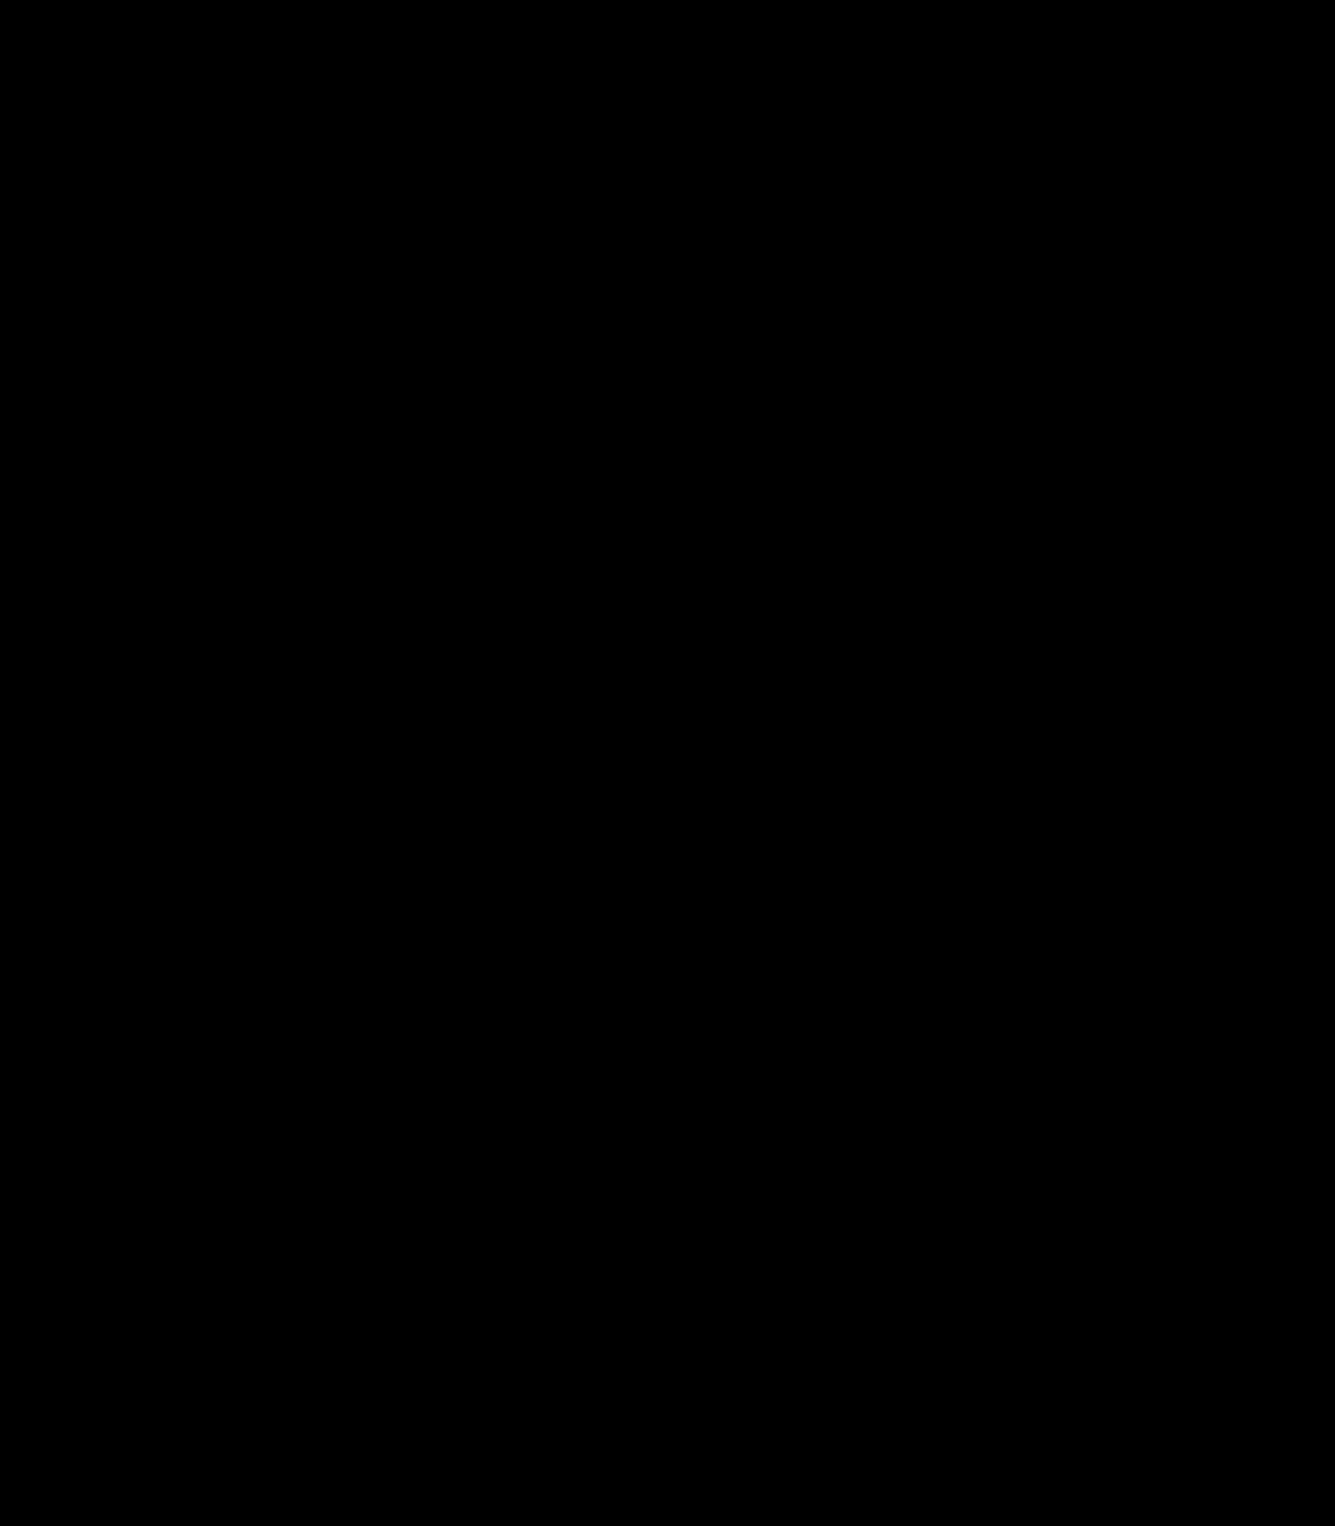 Fruit De Mer Icon Clipart Full Size Clipart 1384504 Pinclipart